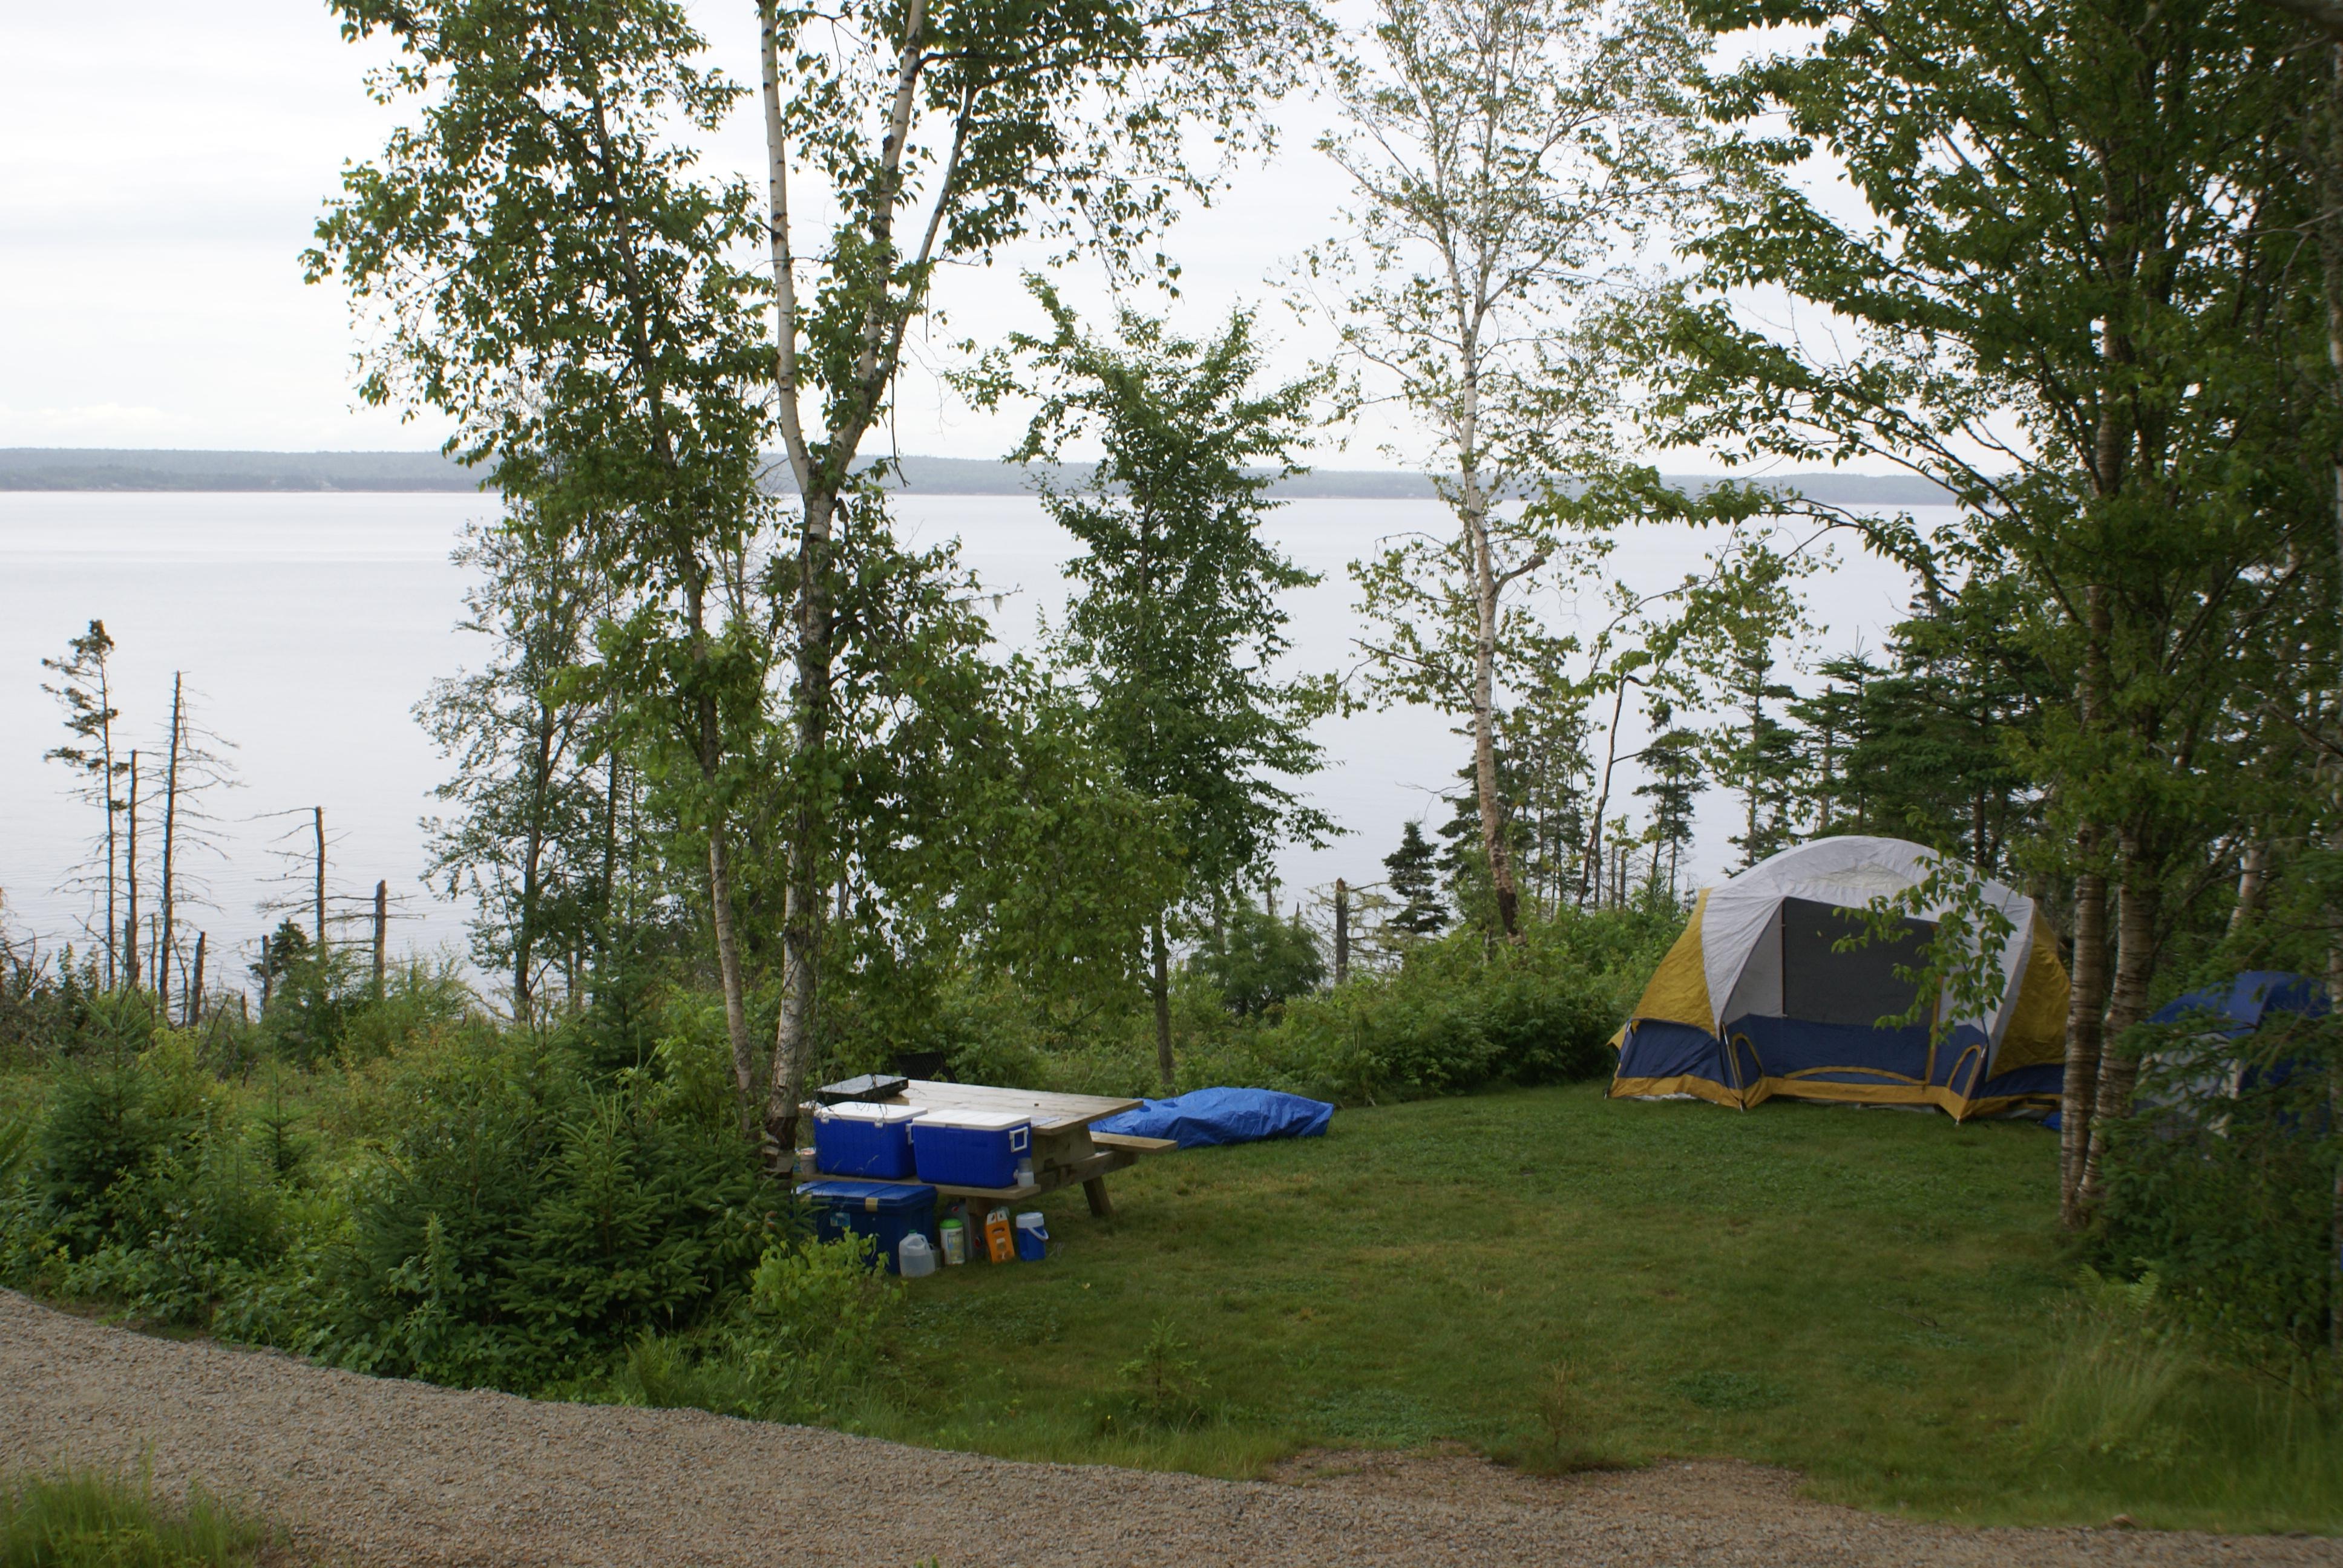 Camping Near Truro Ns Camping Near Truro Ns